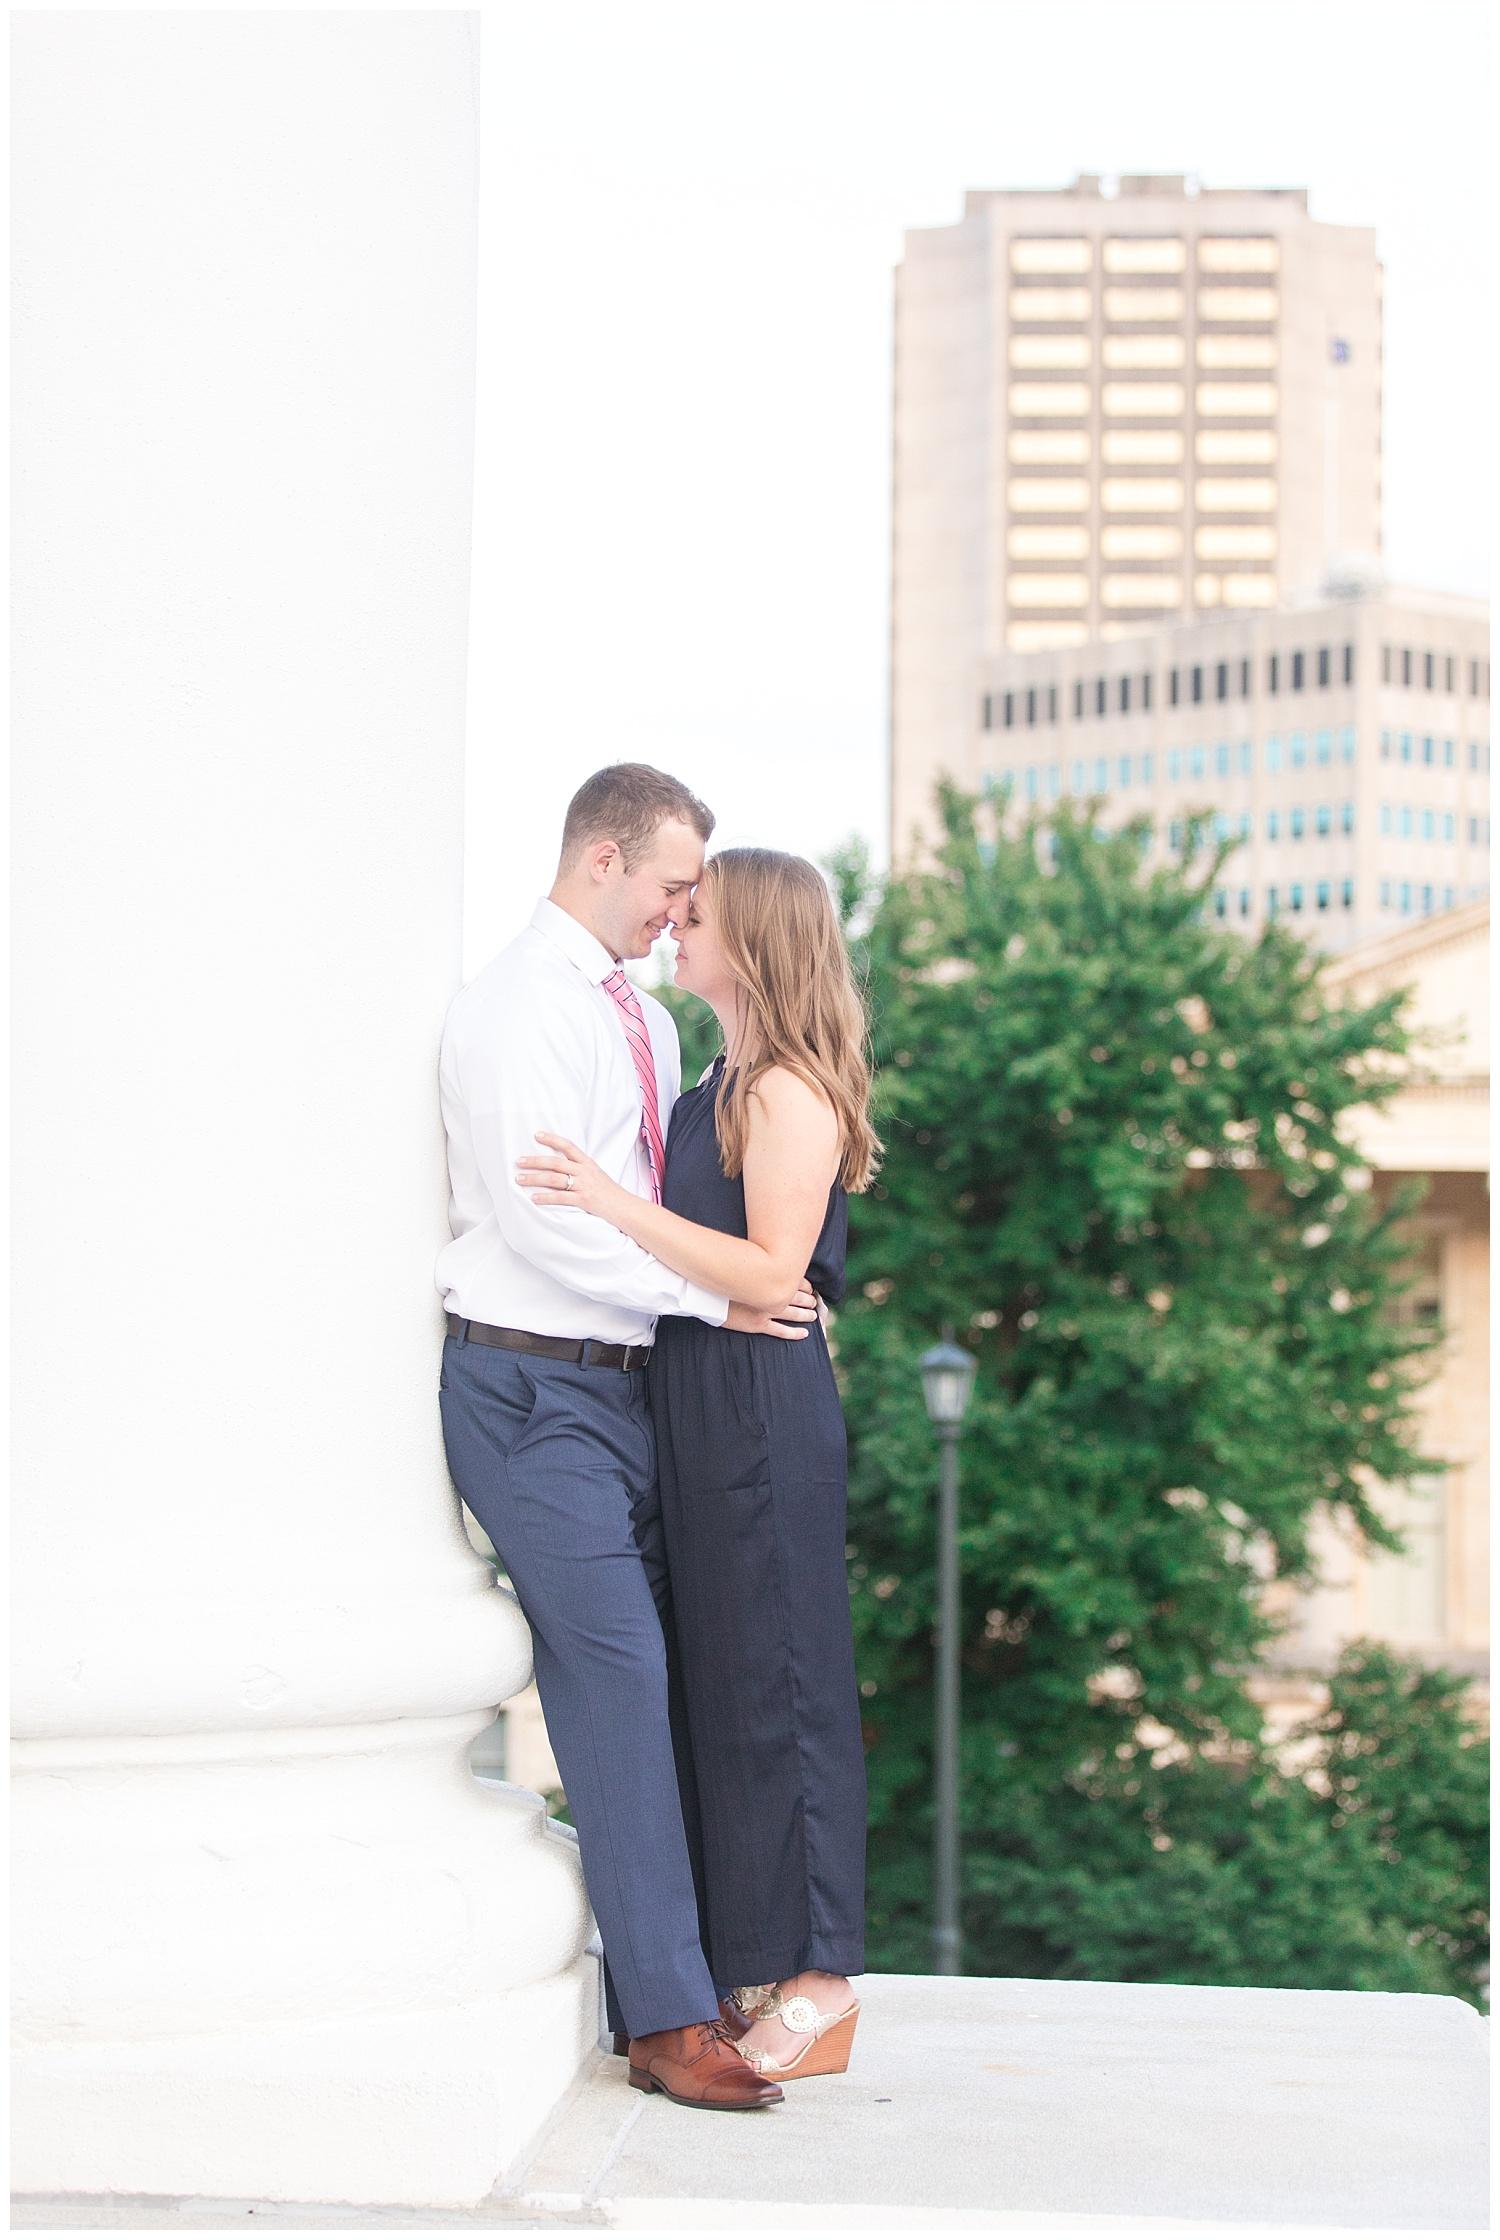 MJMP Richmond Wedding Photographer Summer Virginia State Capitol Engagement Session_0014.jpg